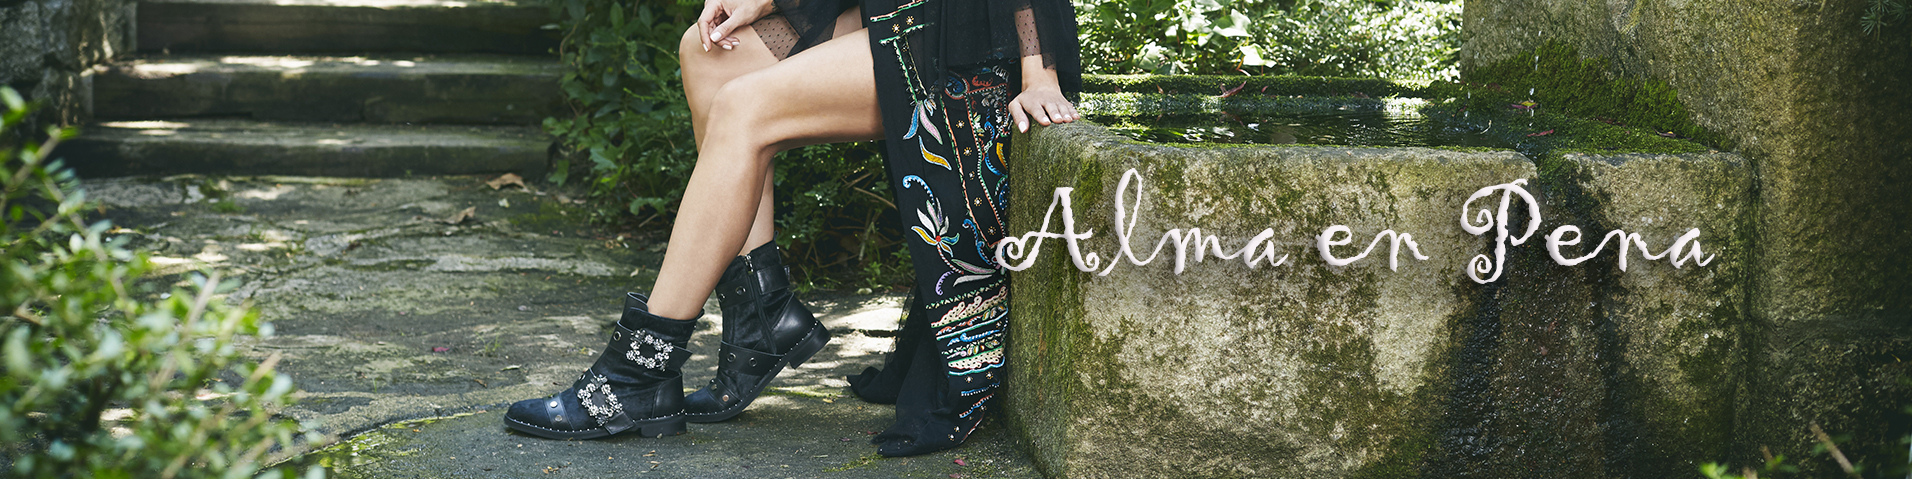 Online Mujer Calzado De Zapatos Pena Alma En Comprar Femenino qwnf81